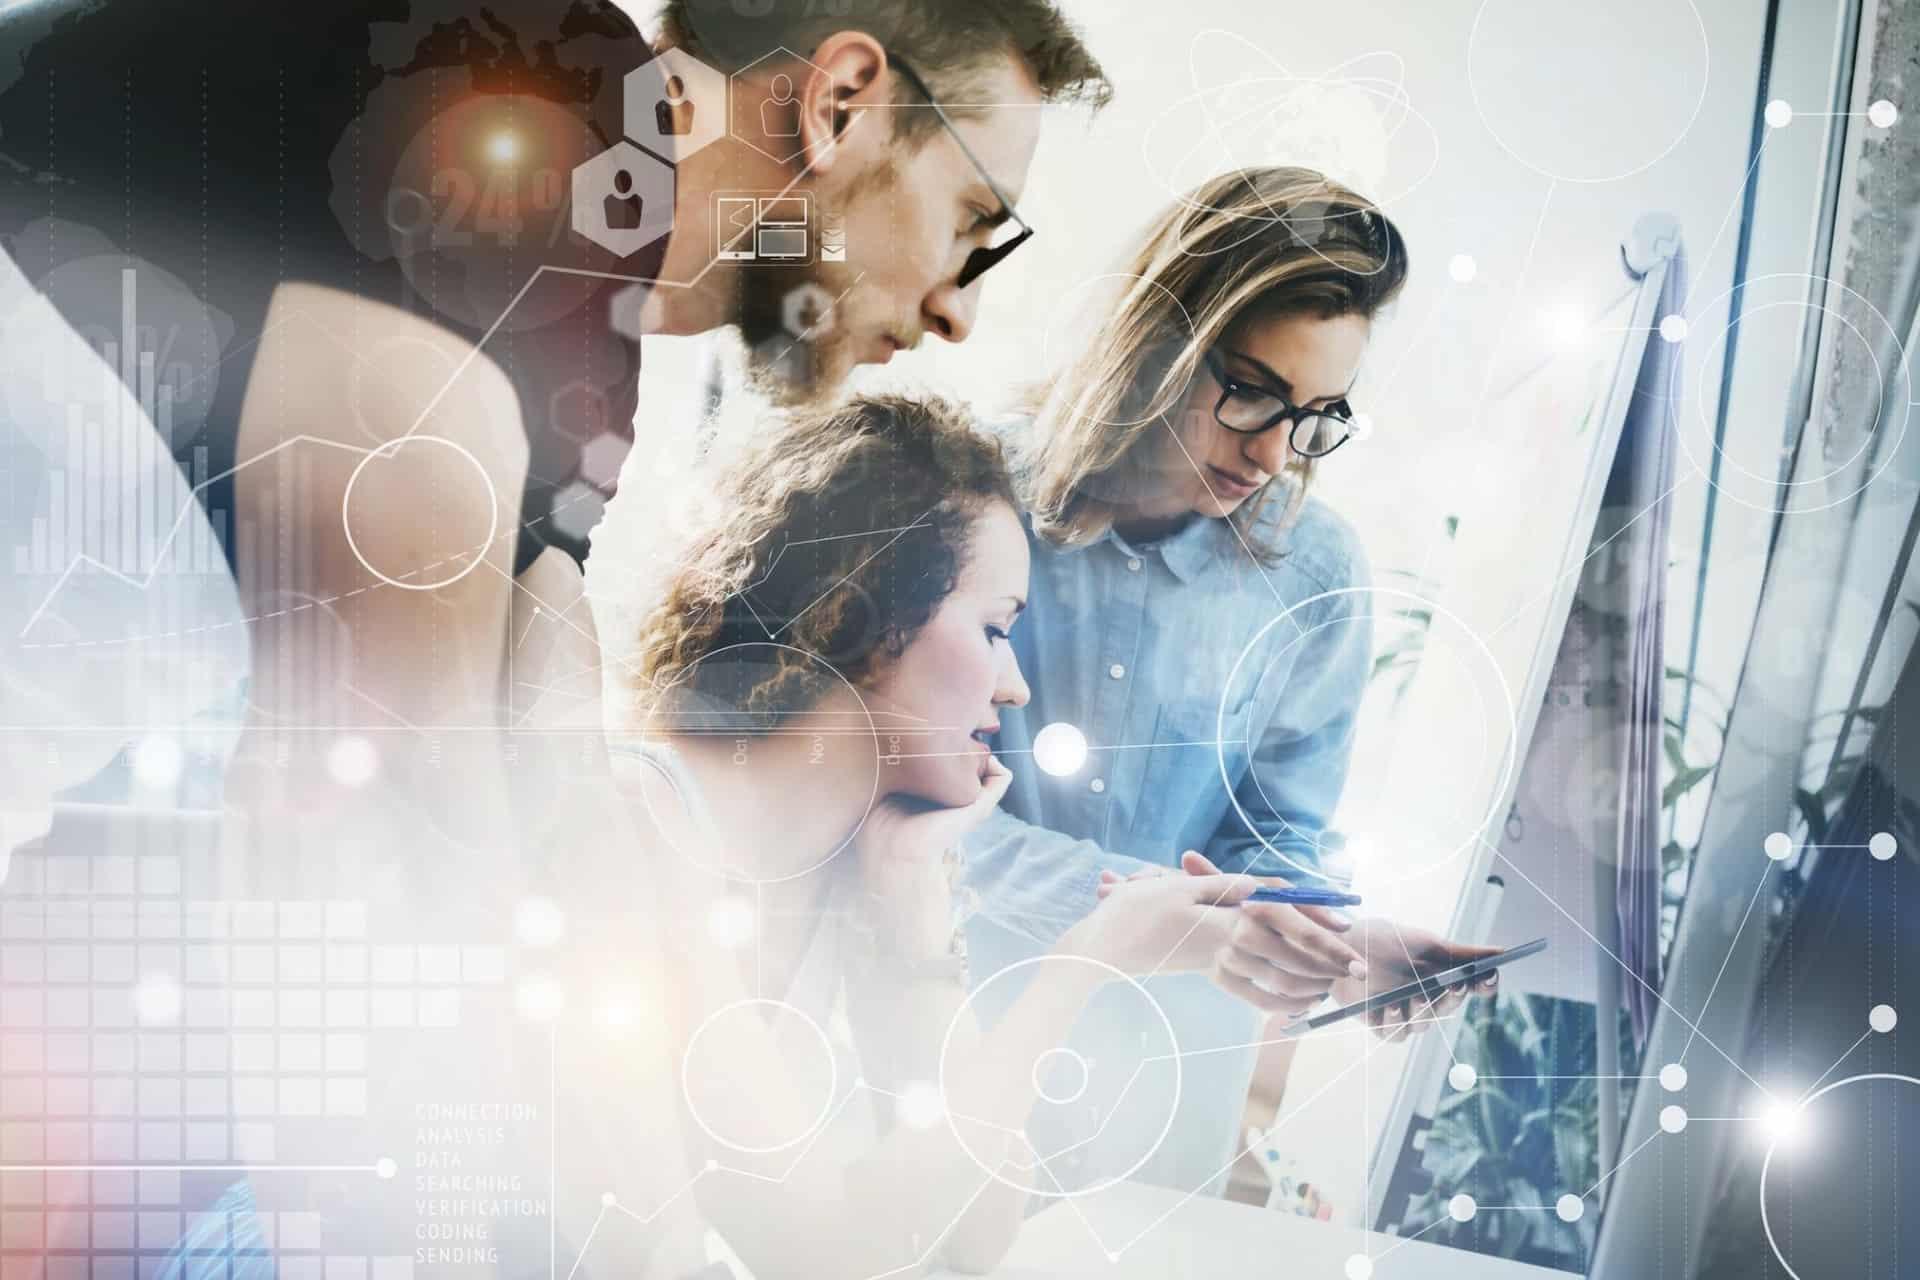 Build a Risk Management Program with the HITRUST CSF®